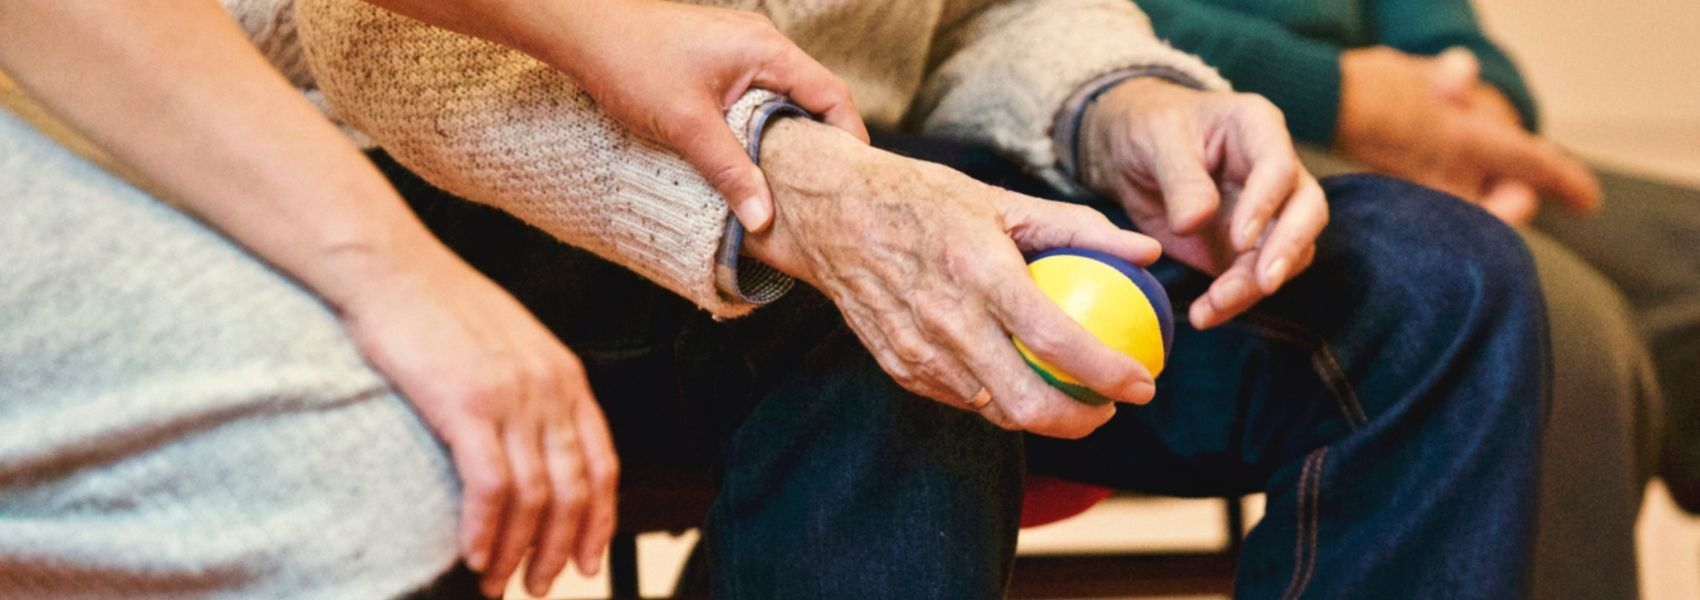 estatuto do cuidador informal